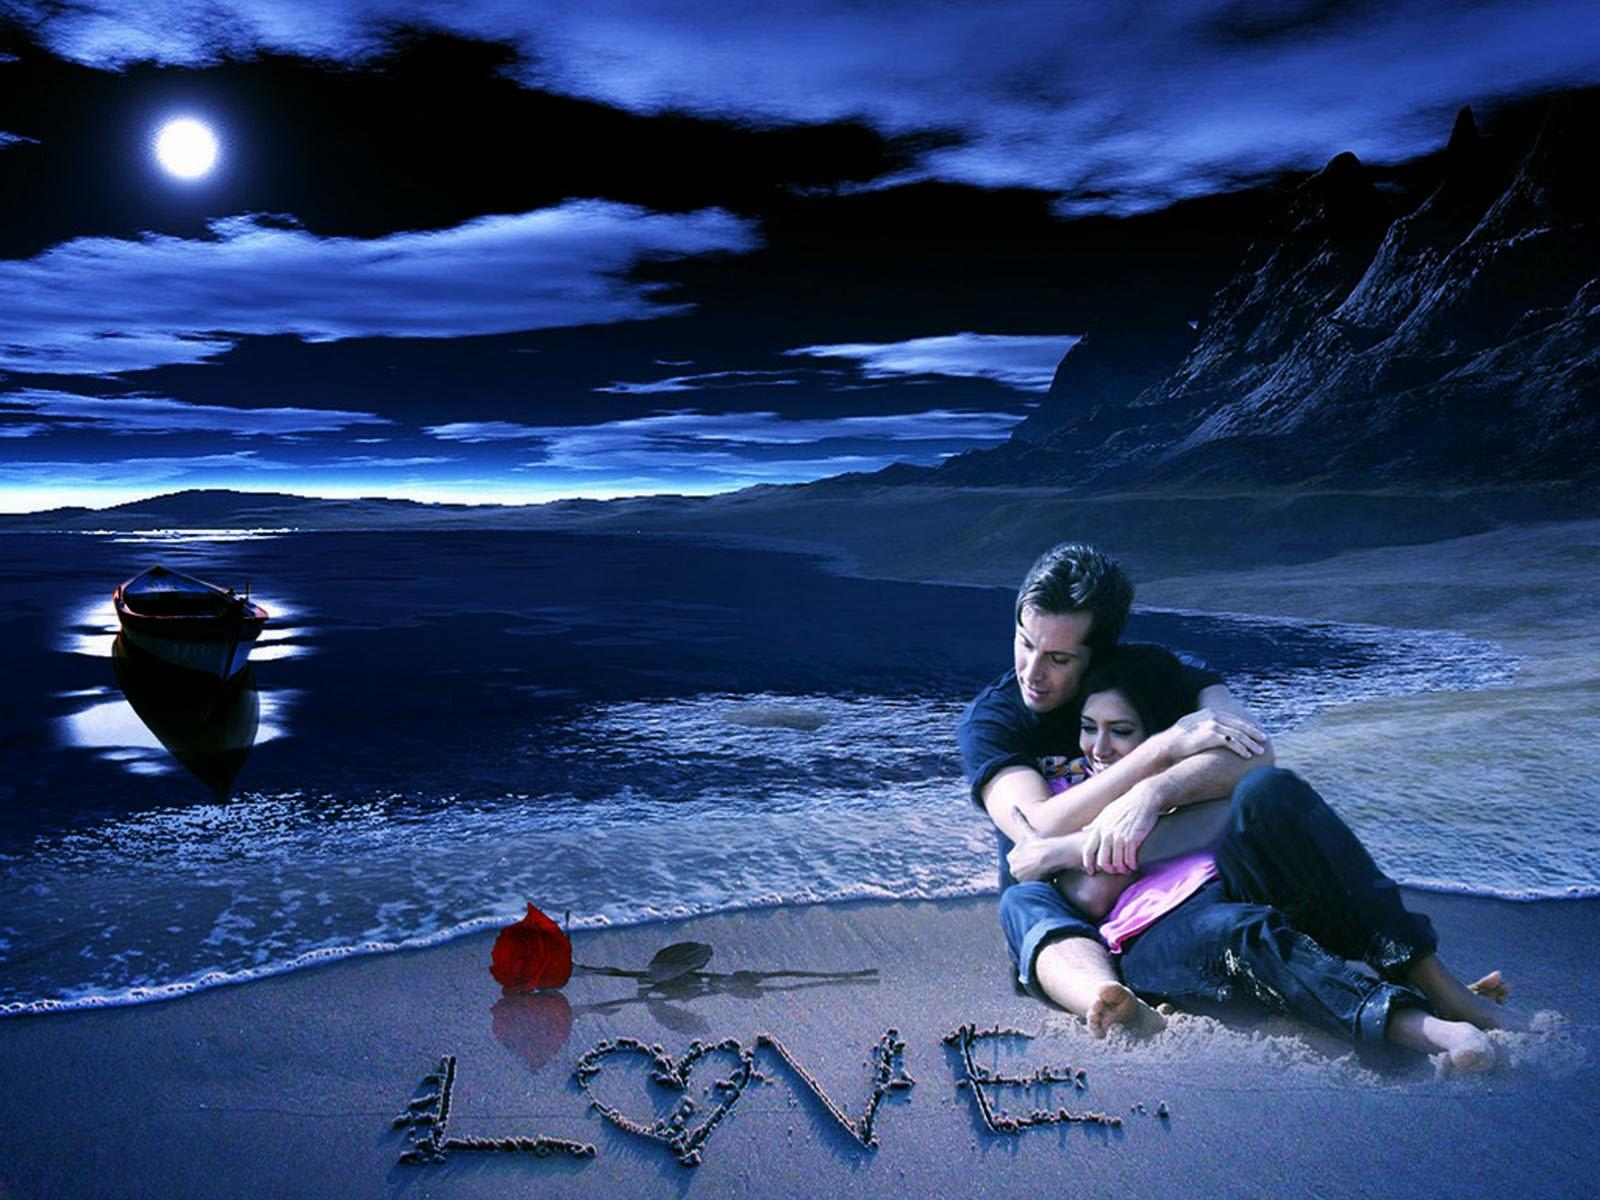 True Love Couple Wallpapers True Love CoupleDesktop Wallpapers True 1600x1200